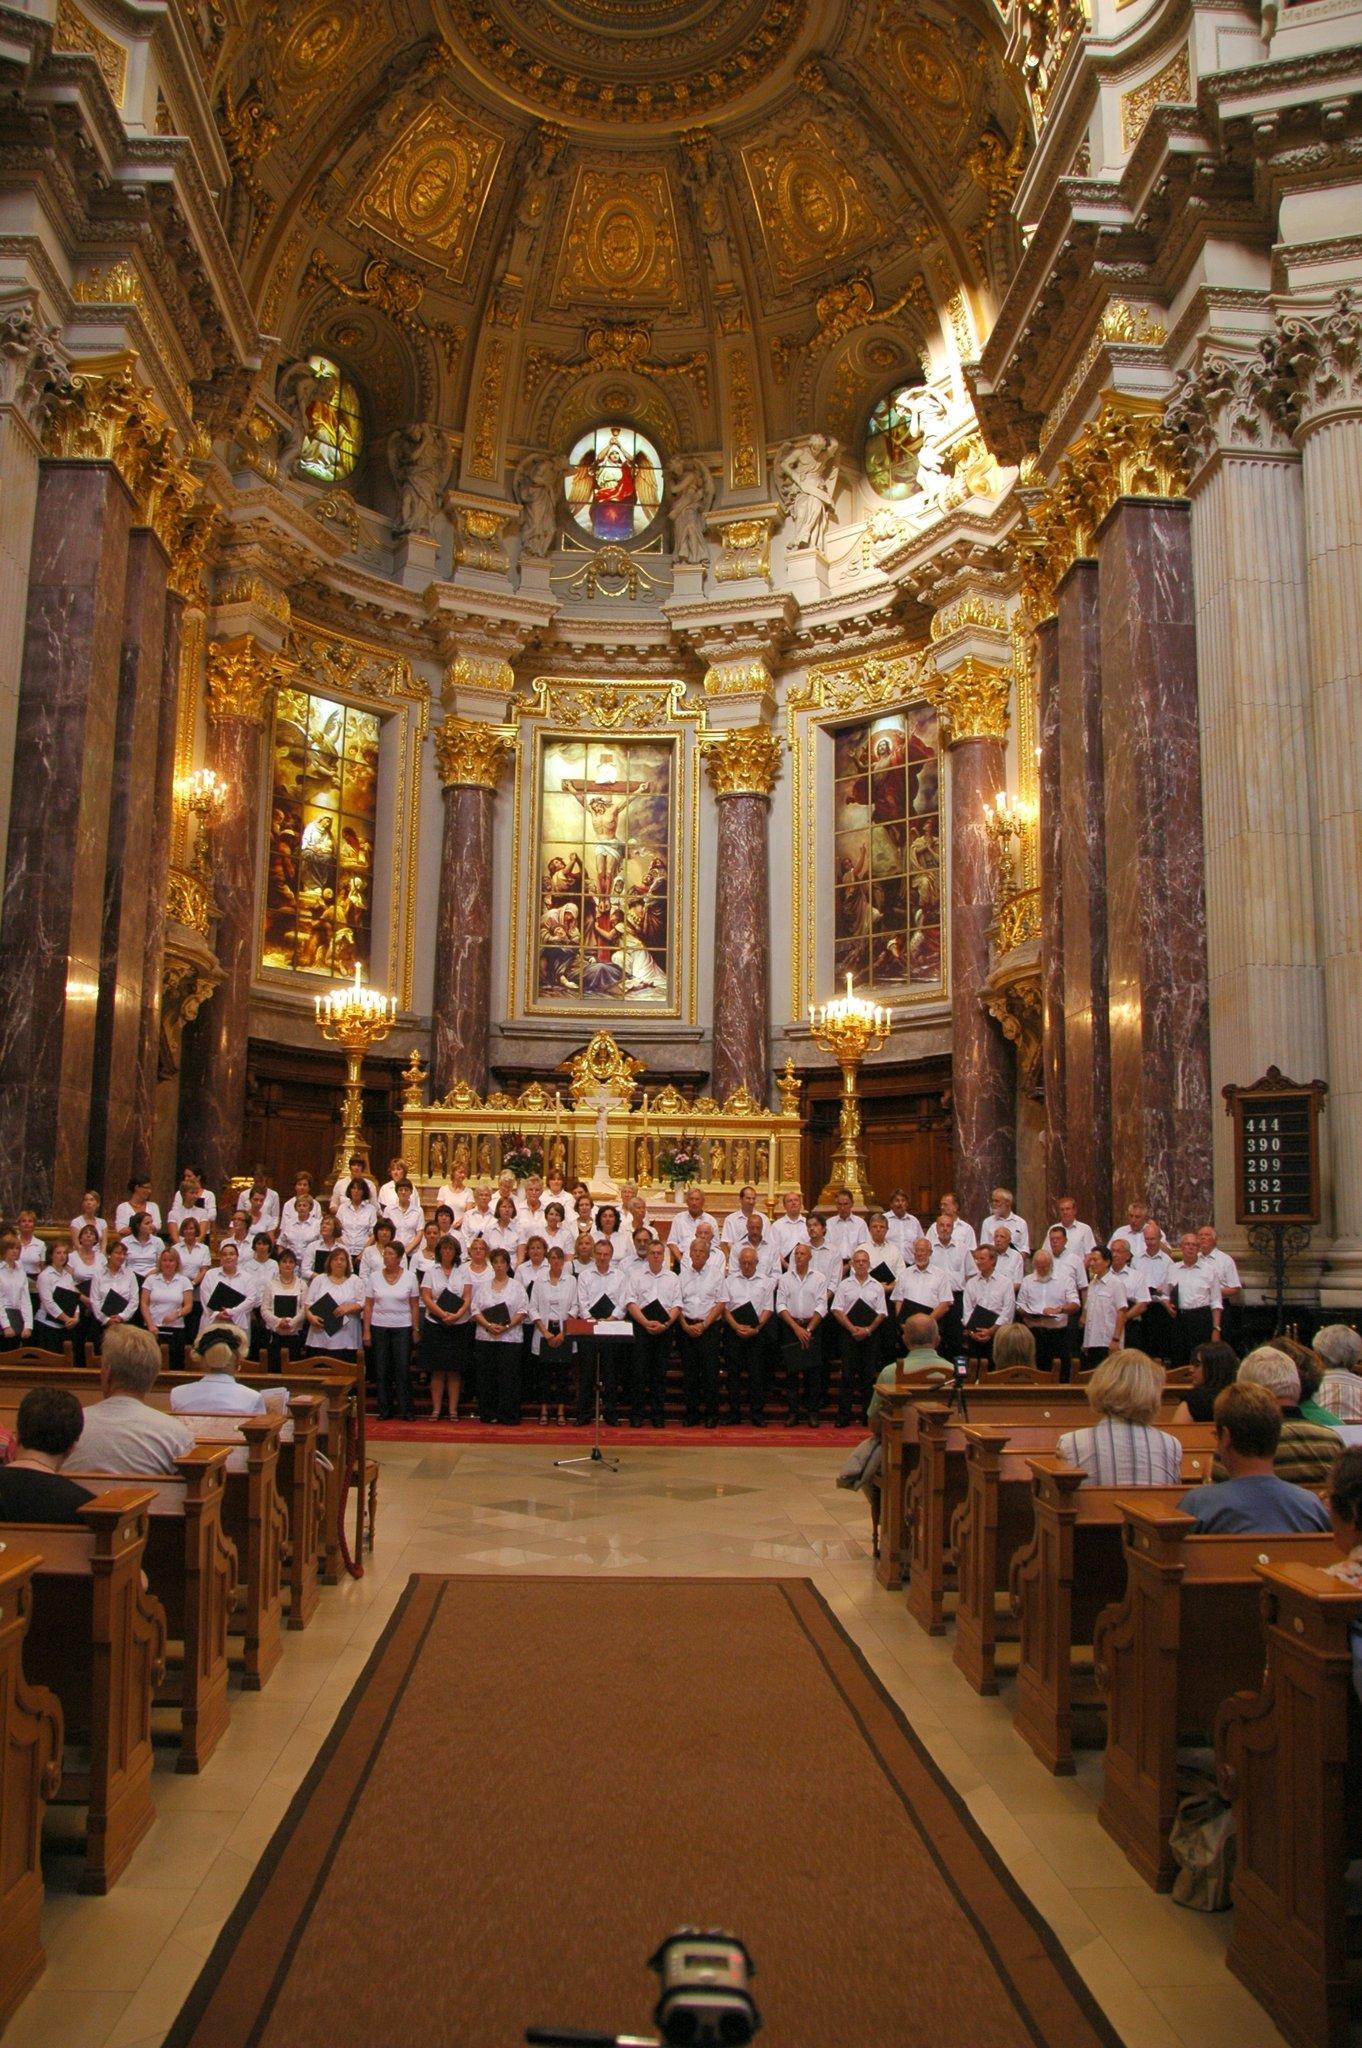 Zum Beitrag Elias Von Mendelssohn Bartholdy Am Sonntag 2 November